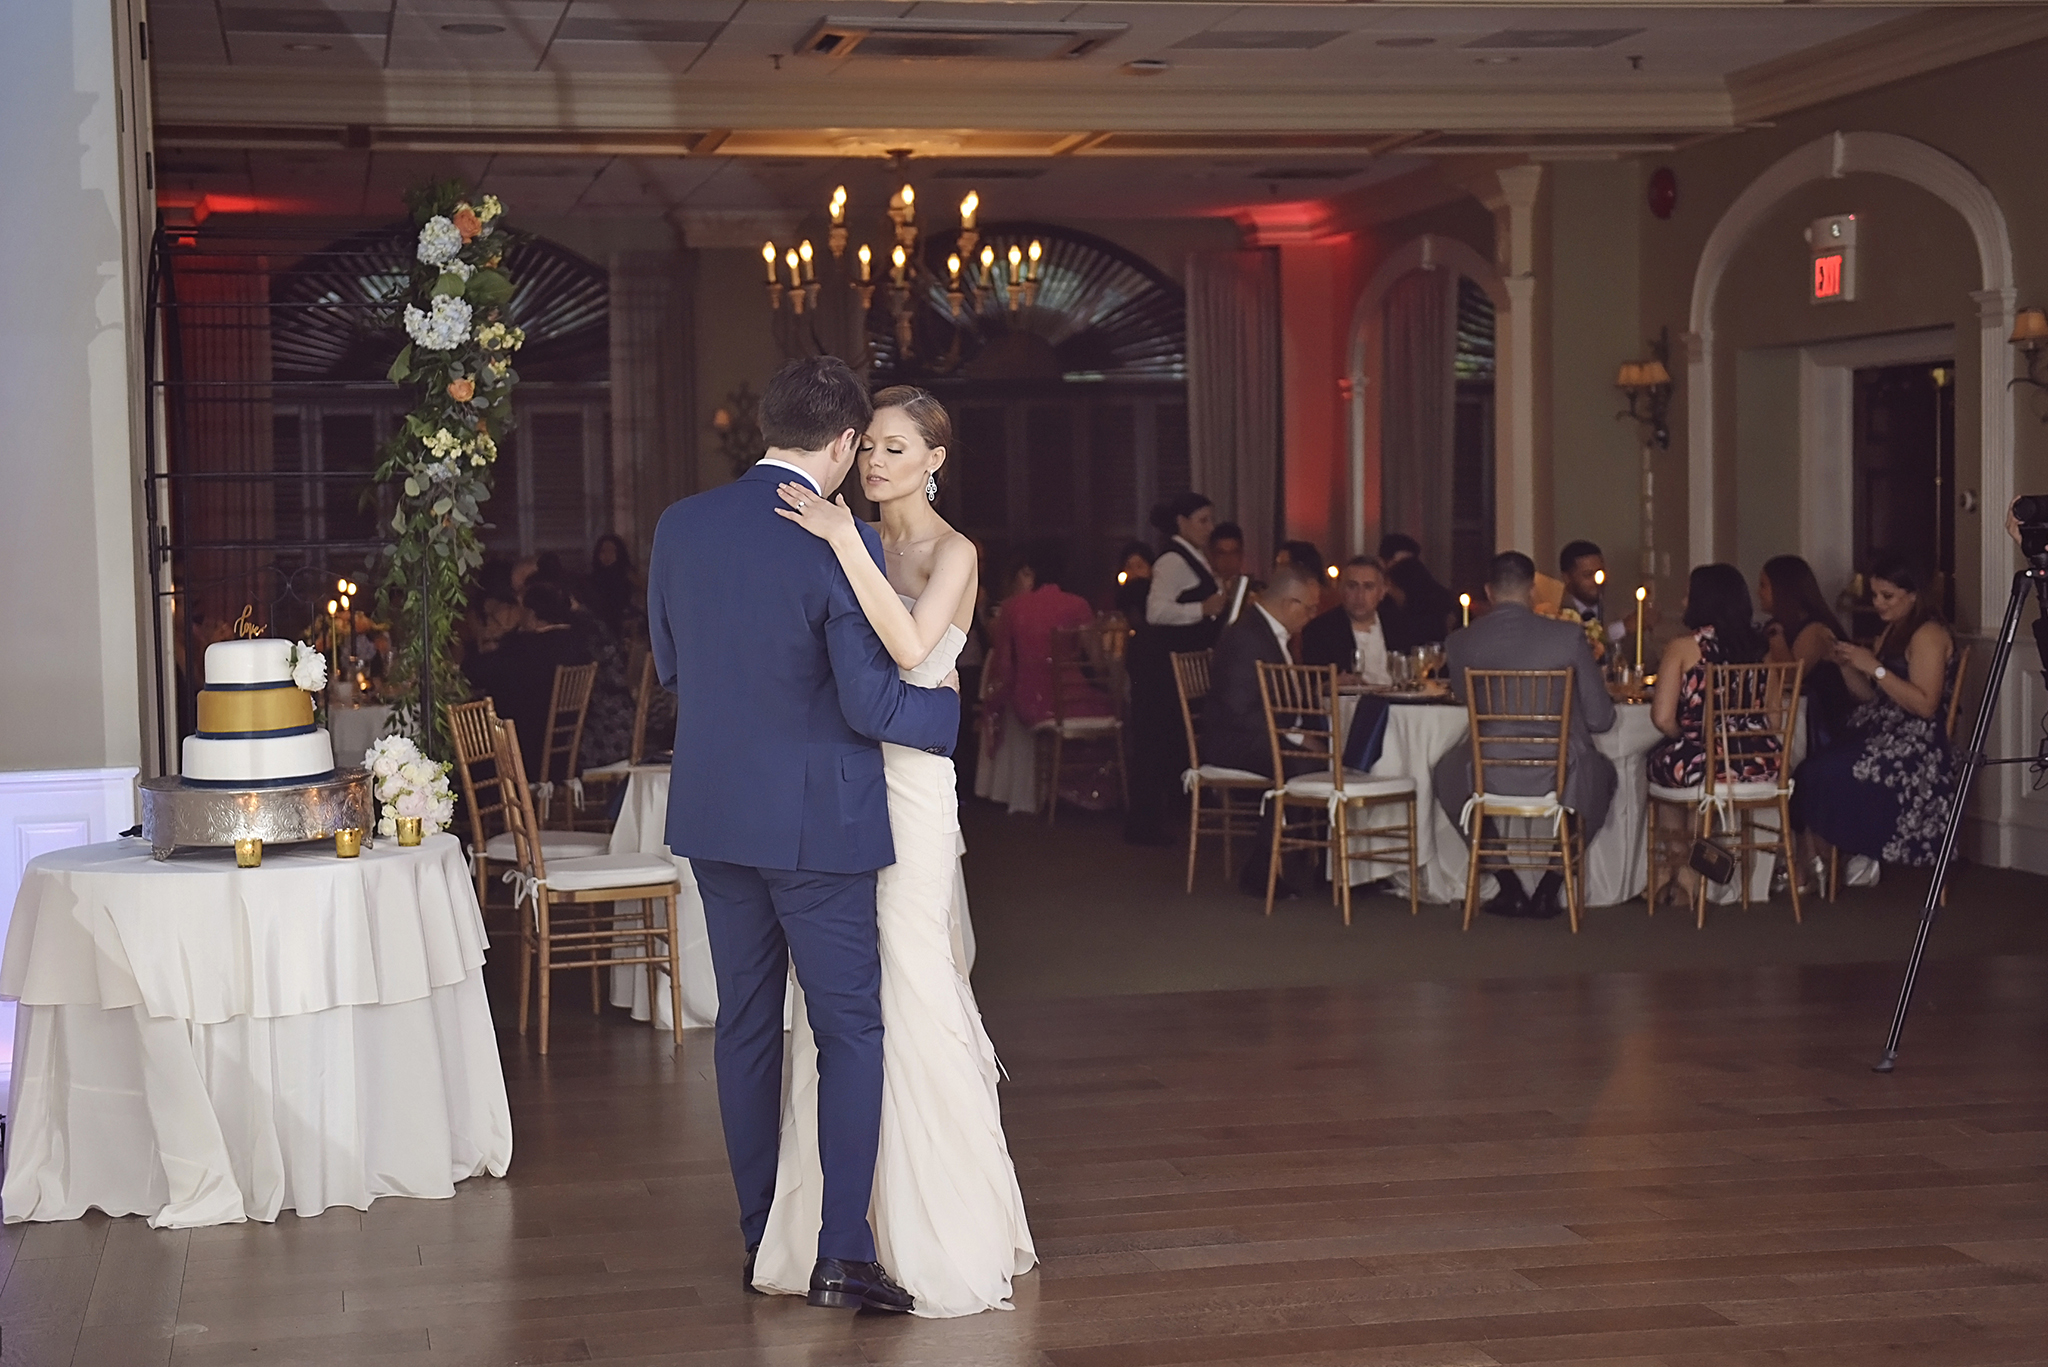 NJ-NY-wedding-photographer-146NJ-NY-wedding-photographer-146NJ-NY-WEDDING-PHOTOGRAPHER-146.JPG